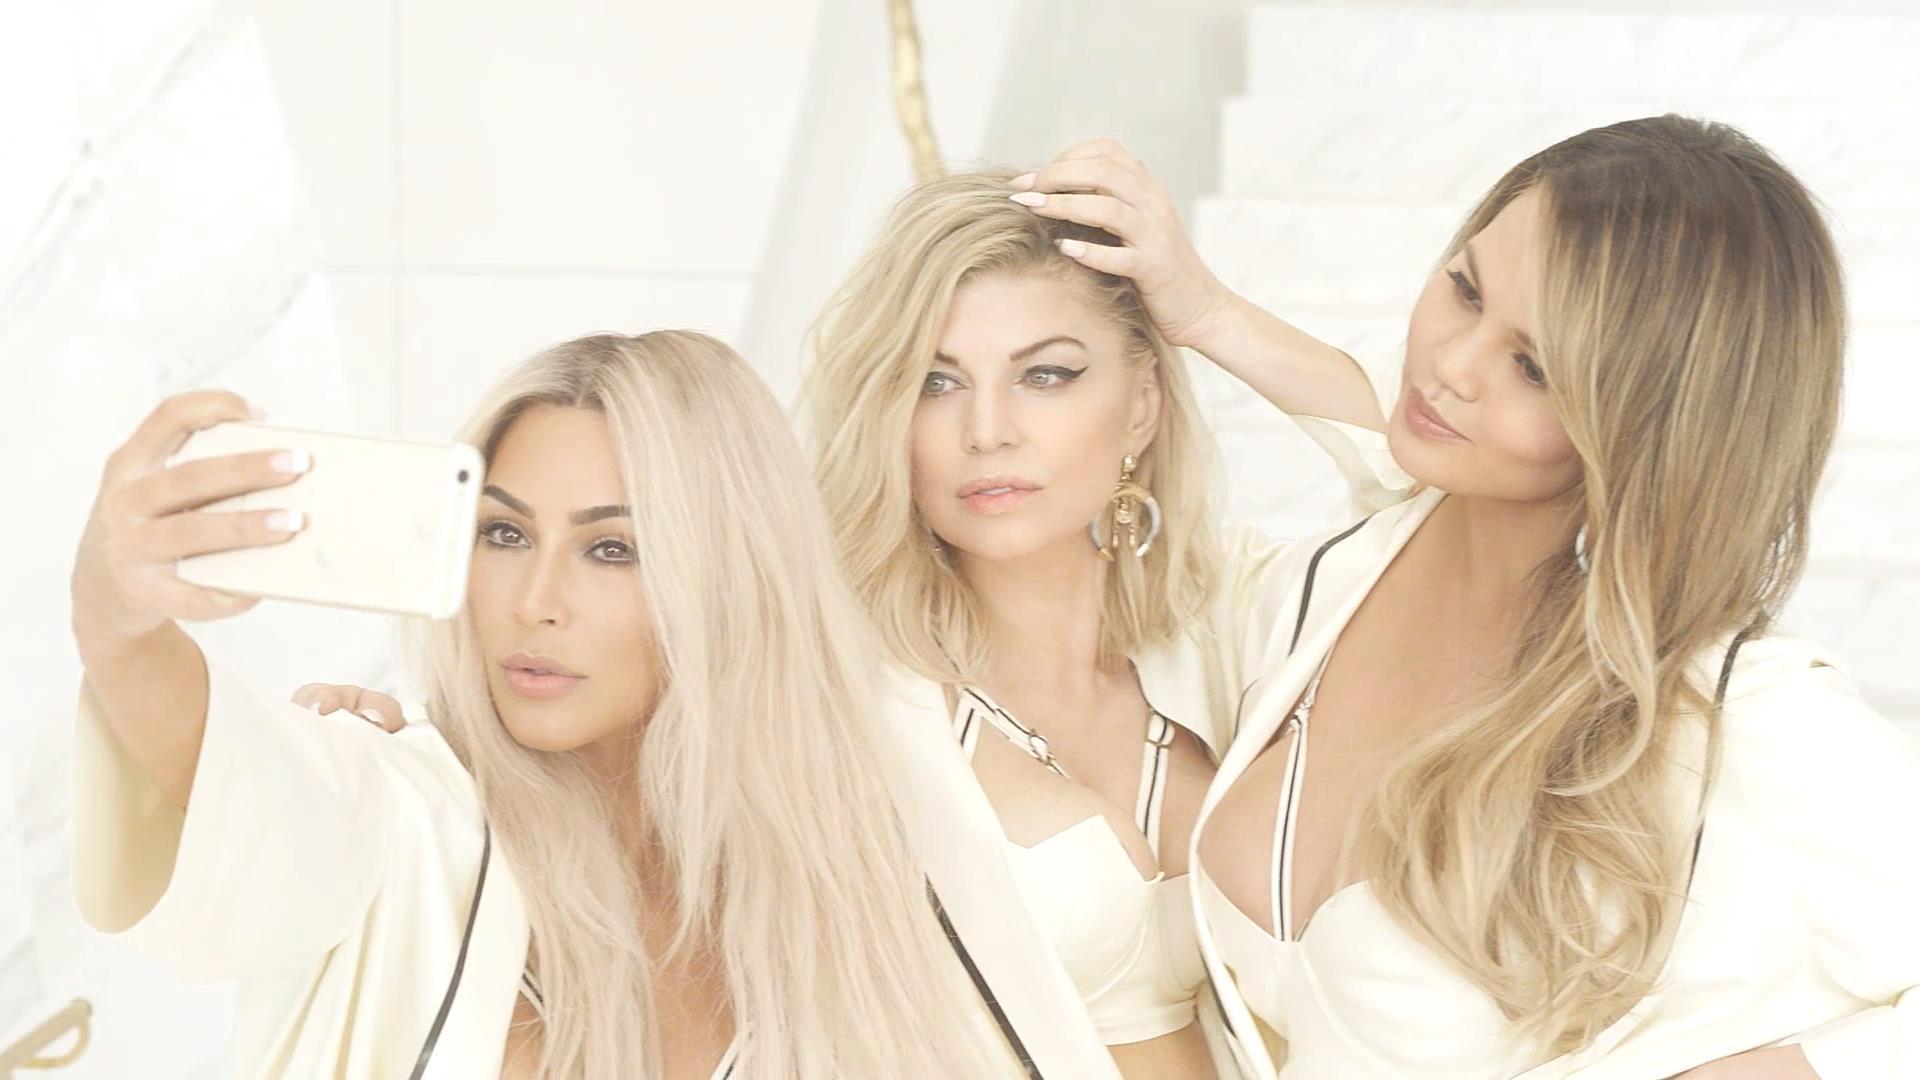 Fergie – M.I.L.F. Money Featuring Kim Kardashian, Ciara, Chrissy Teigen